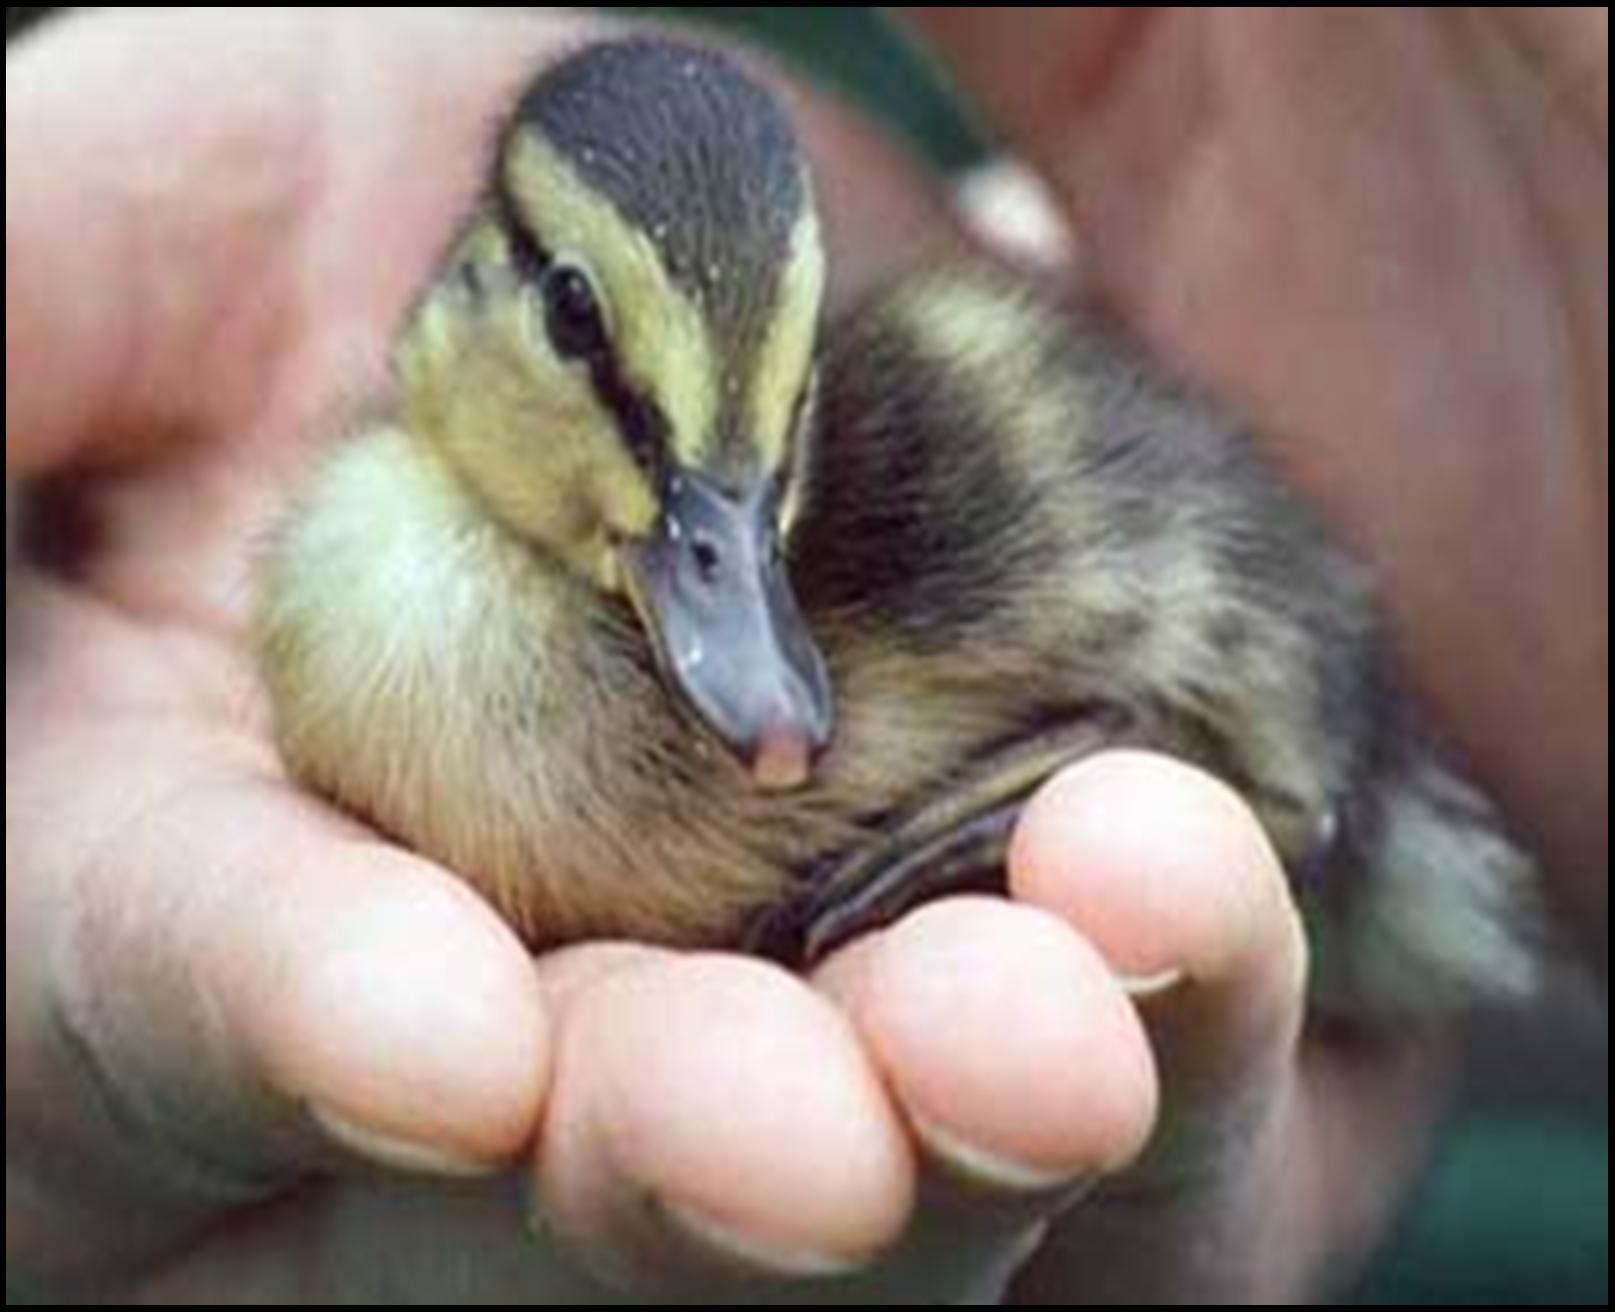 Animal Rights - Animal Rights Photo  32573282